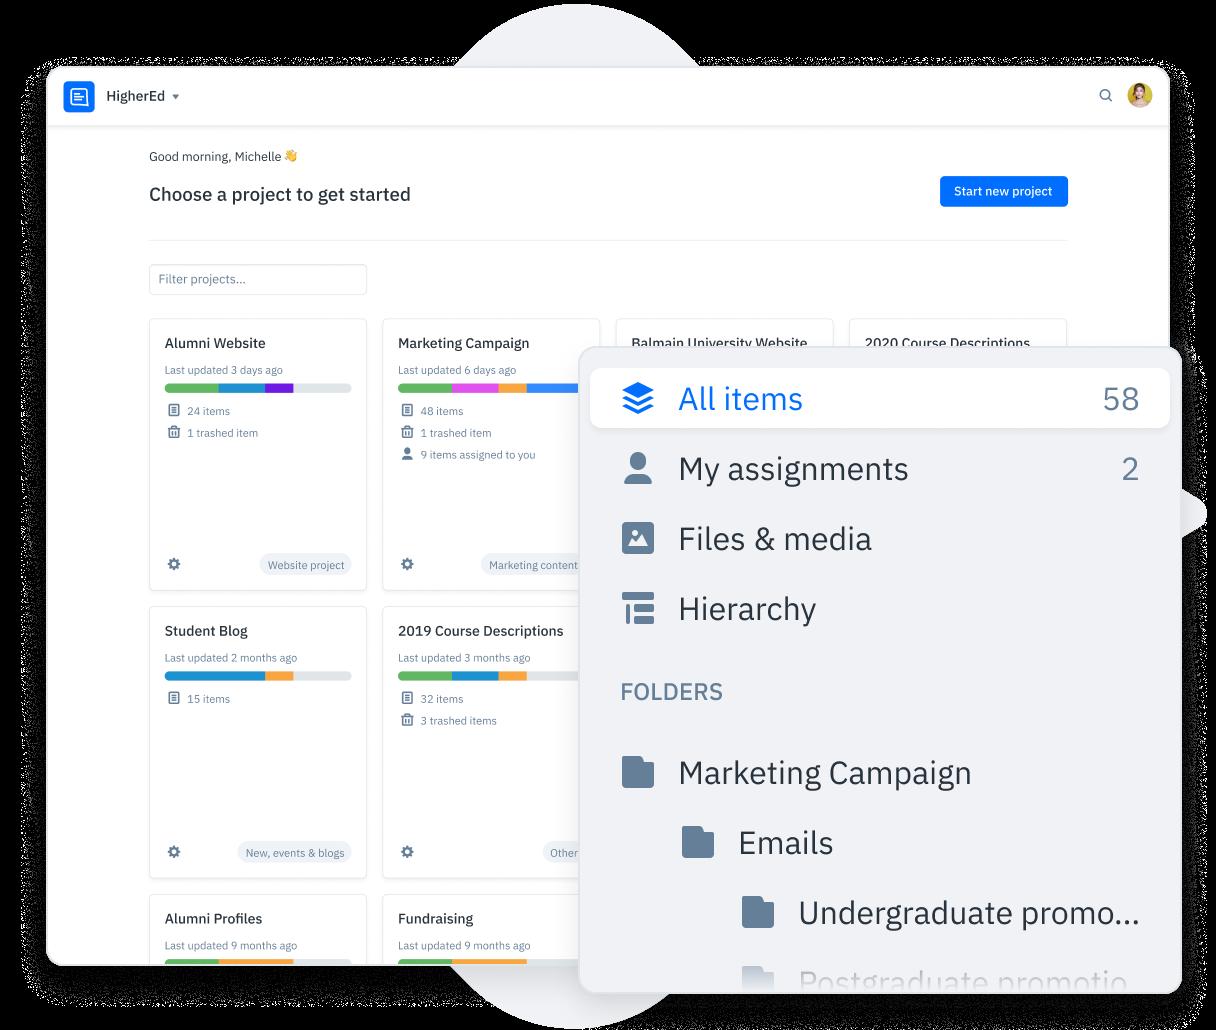 GatherContent Content Dashboard UI